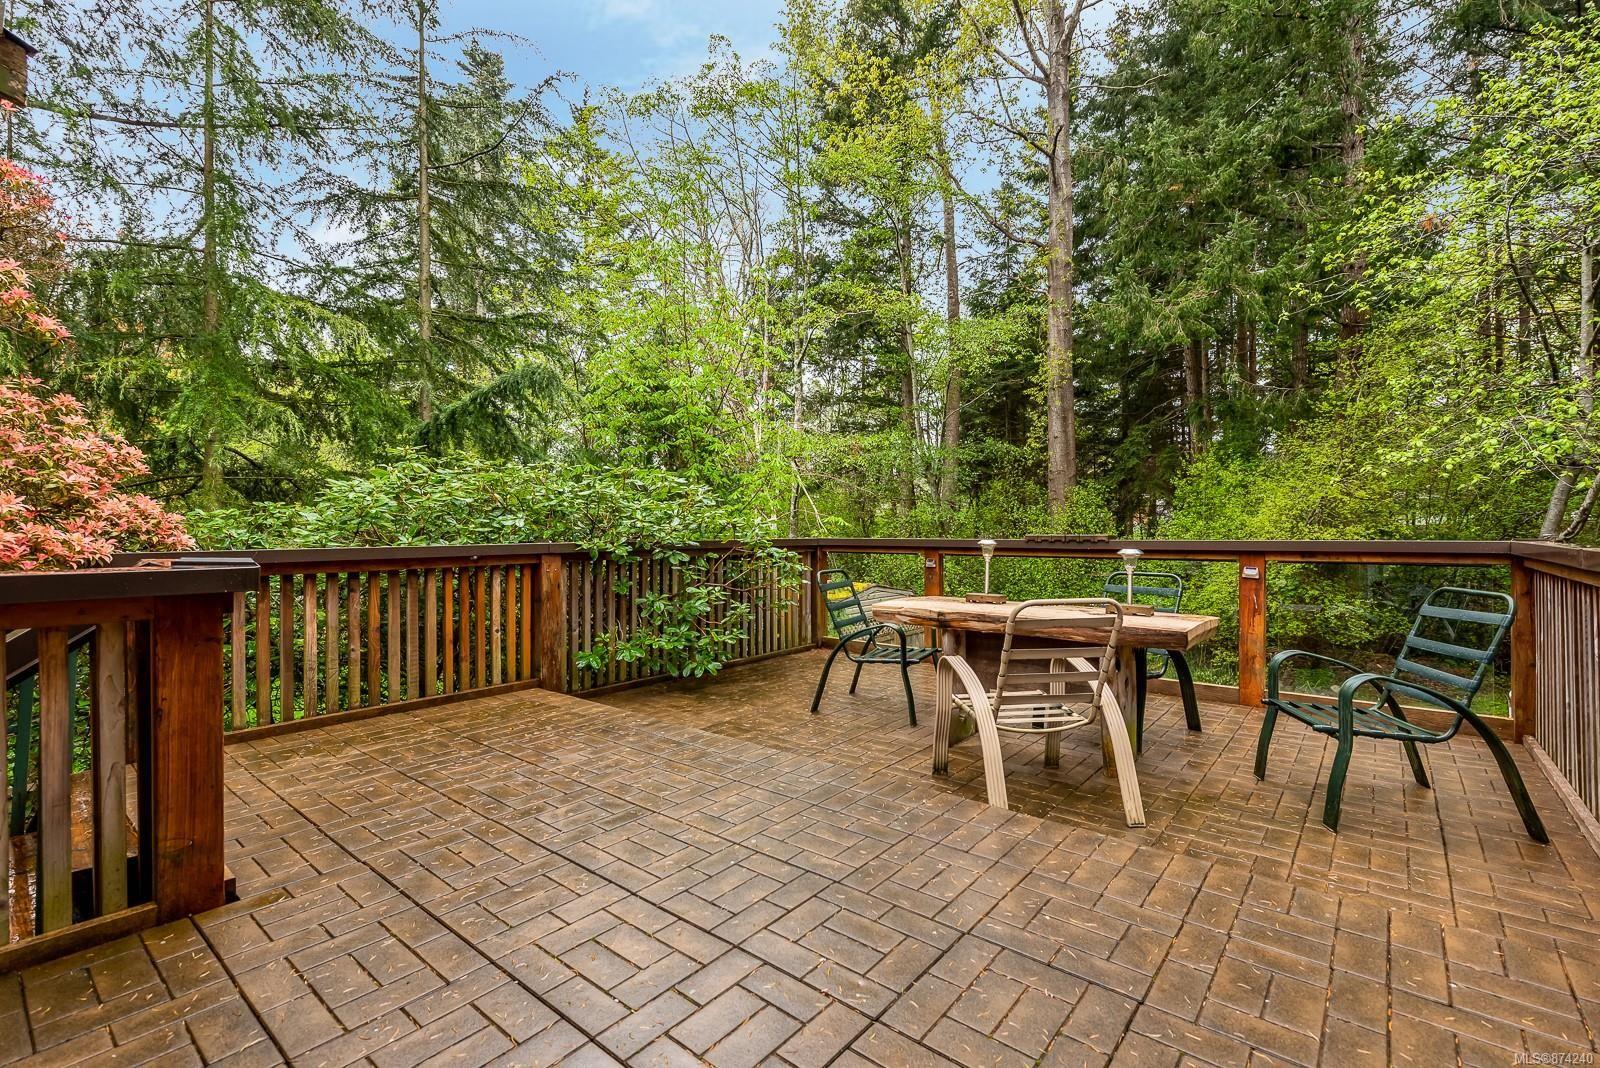 Photo 6: Photos: 359 Cortez Cres in : CV Comox (Town of) House for sale (Comox Valley)  : MLS®# 874240